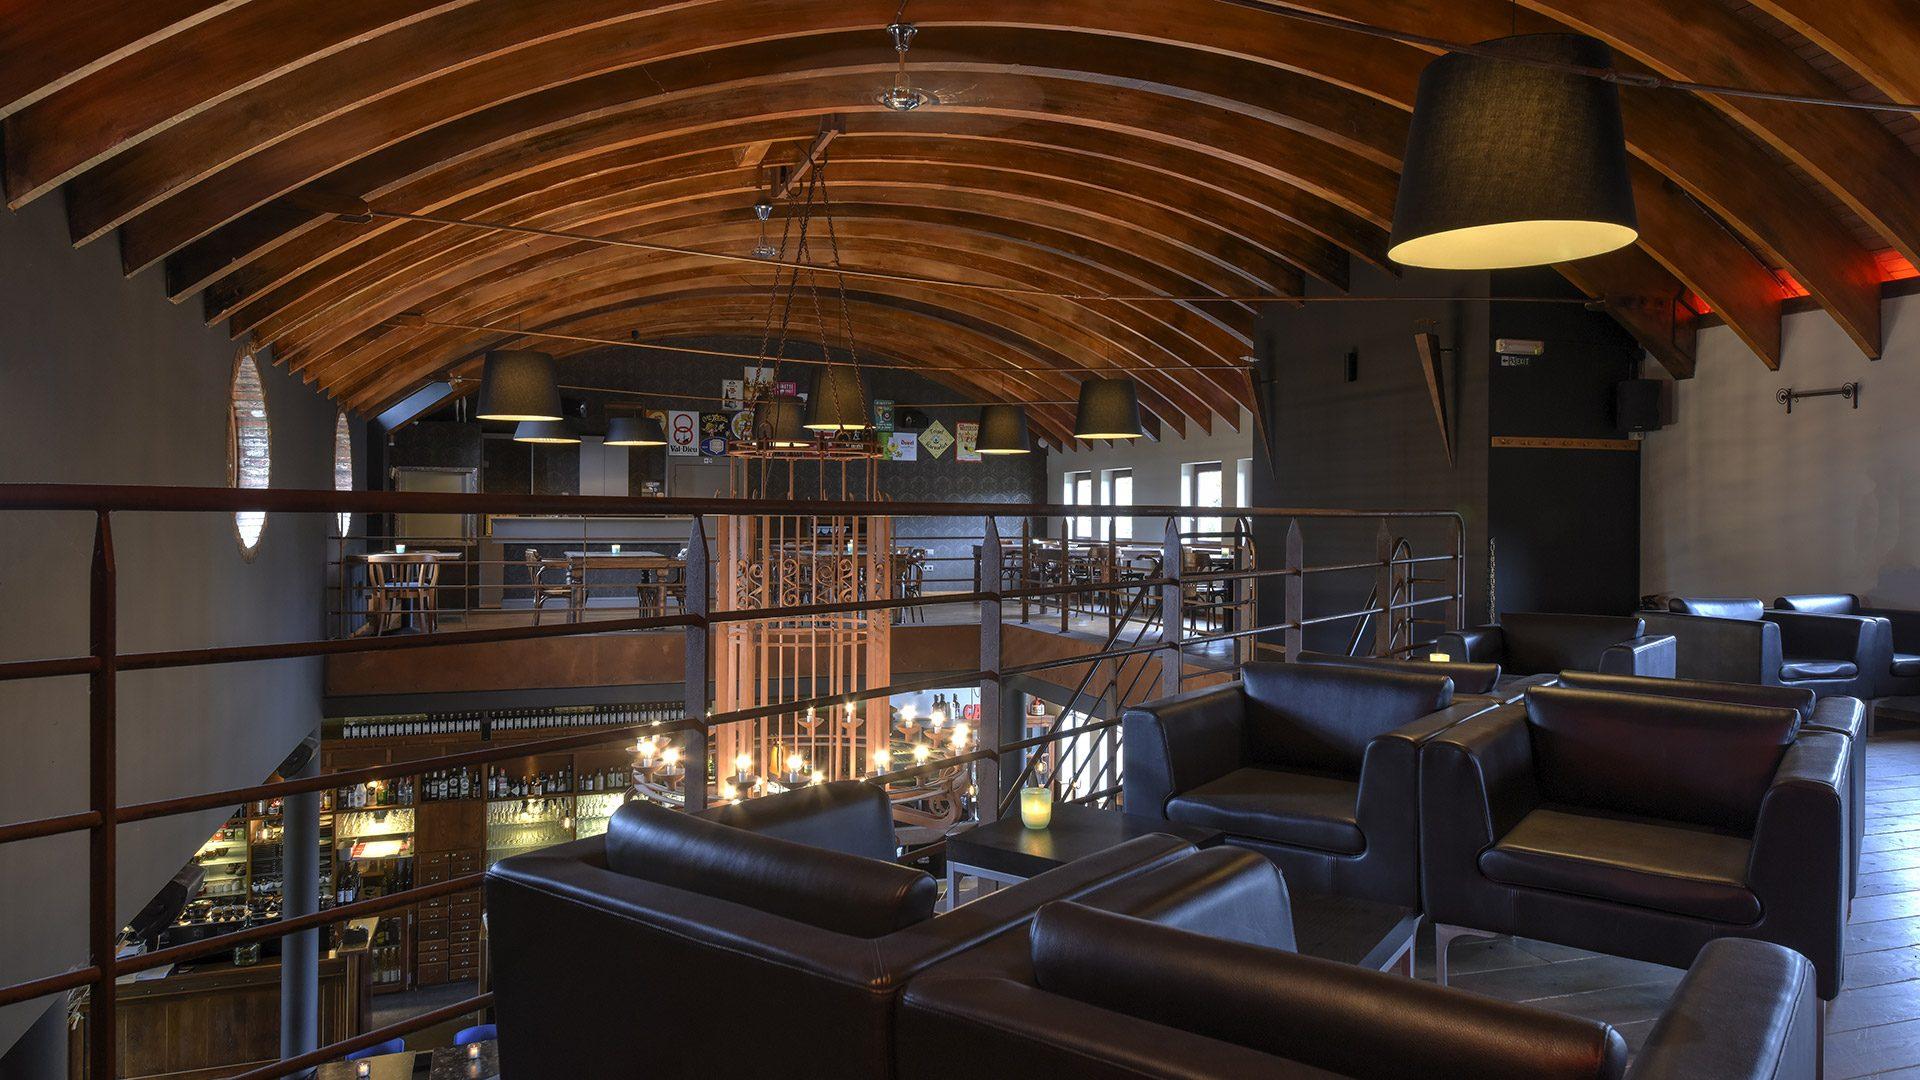 Home - Grand Café Paal 26